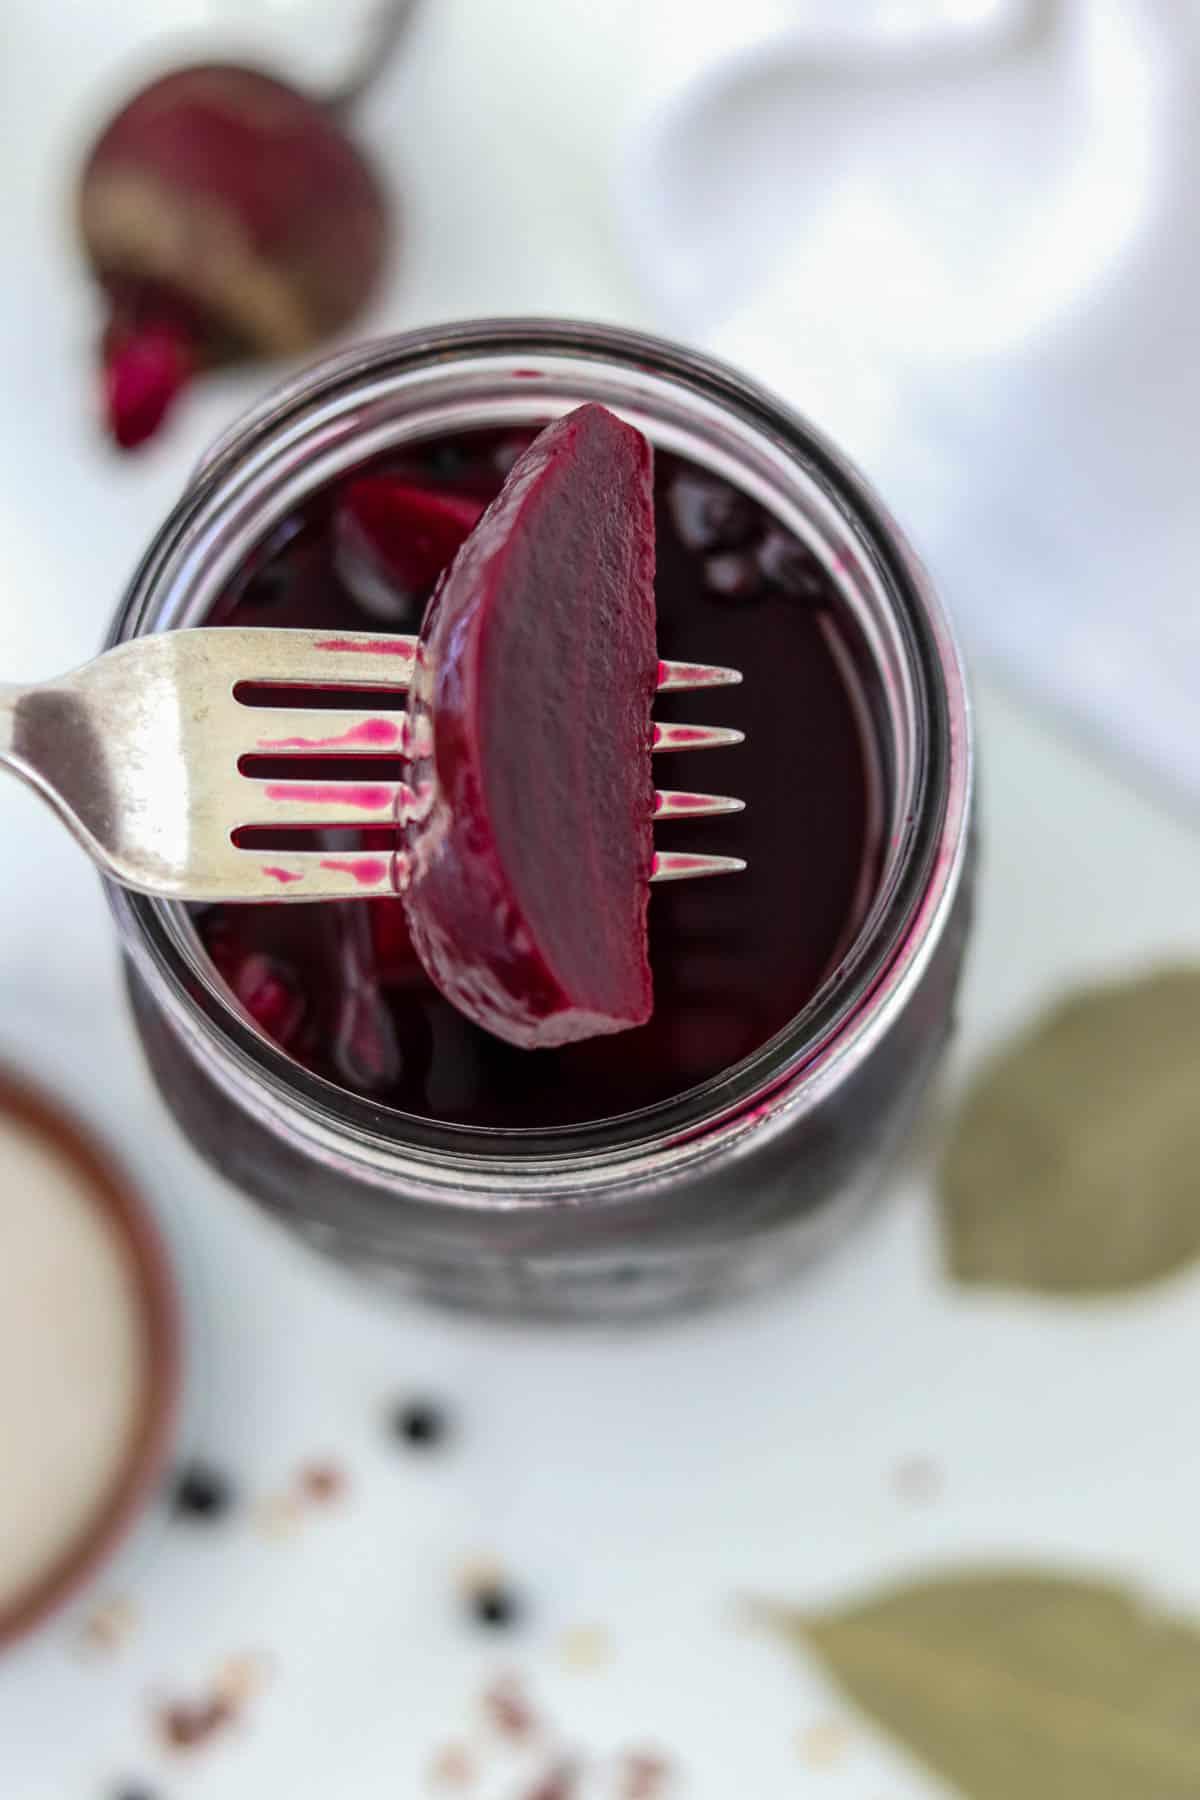 A pickled beet on a fork over a jar.